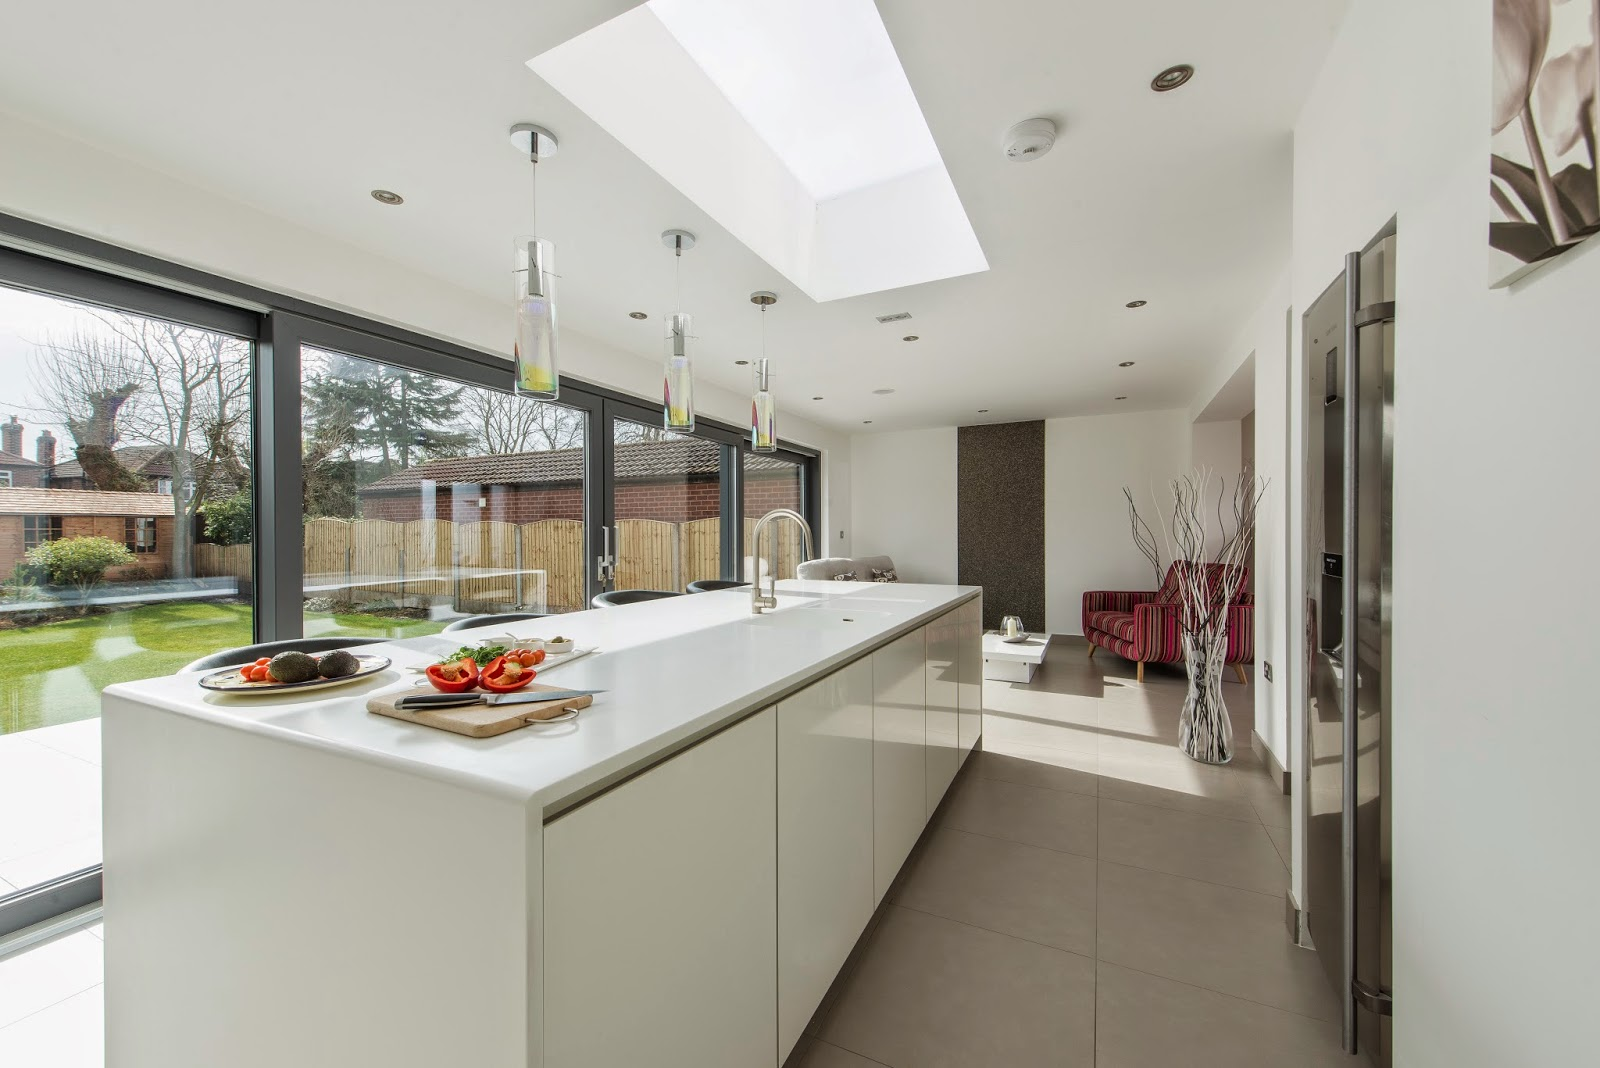 Mr And Mrs Smith Kitchen diane berry kitchens - client kitchens: mr & mrs smith